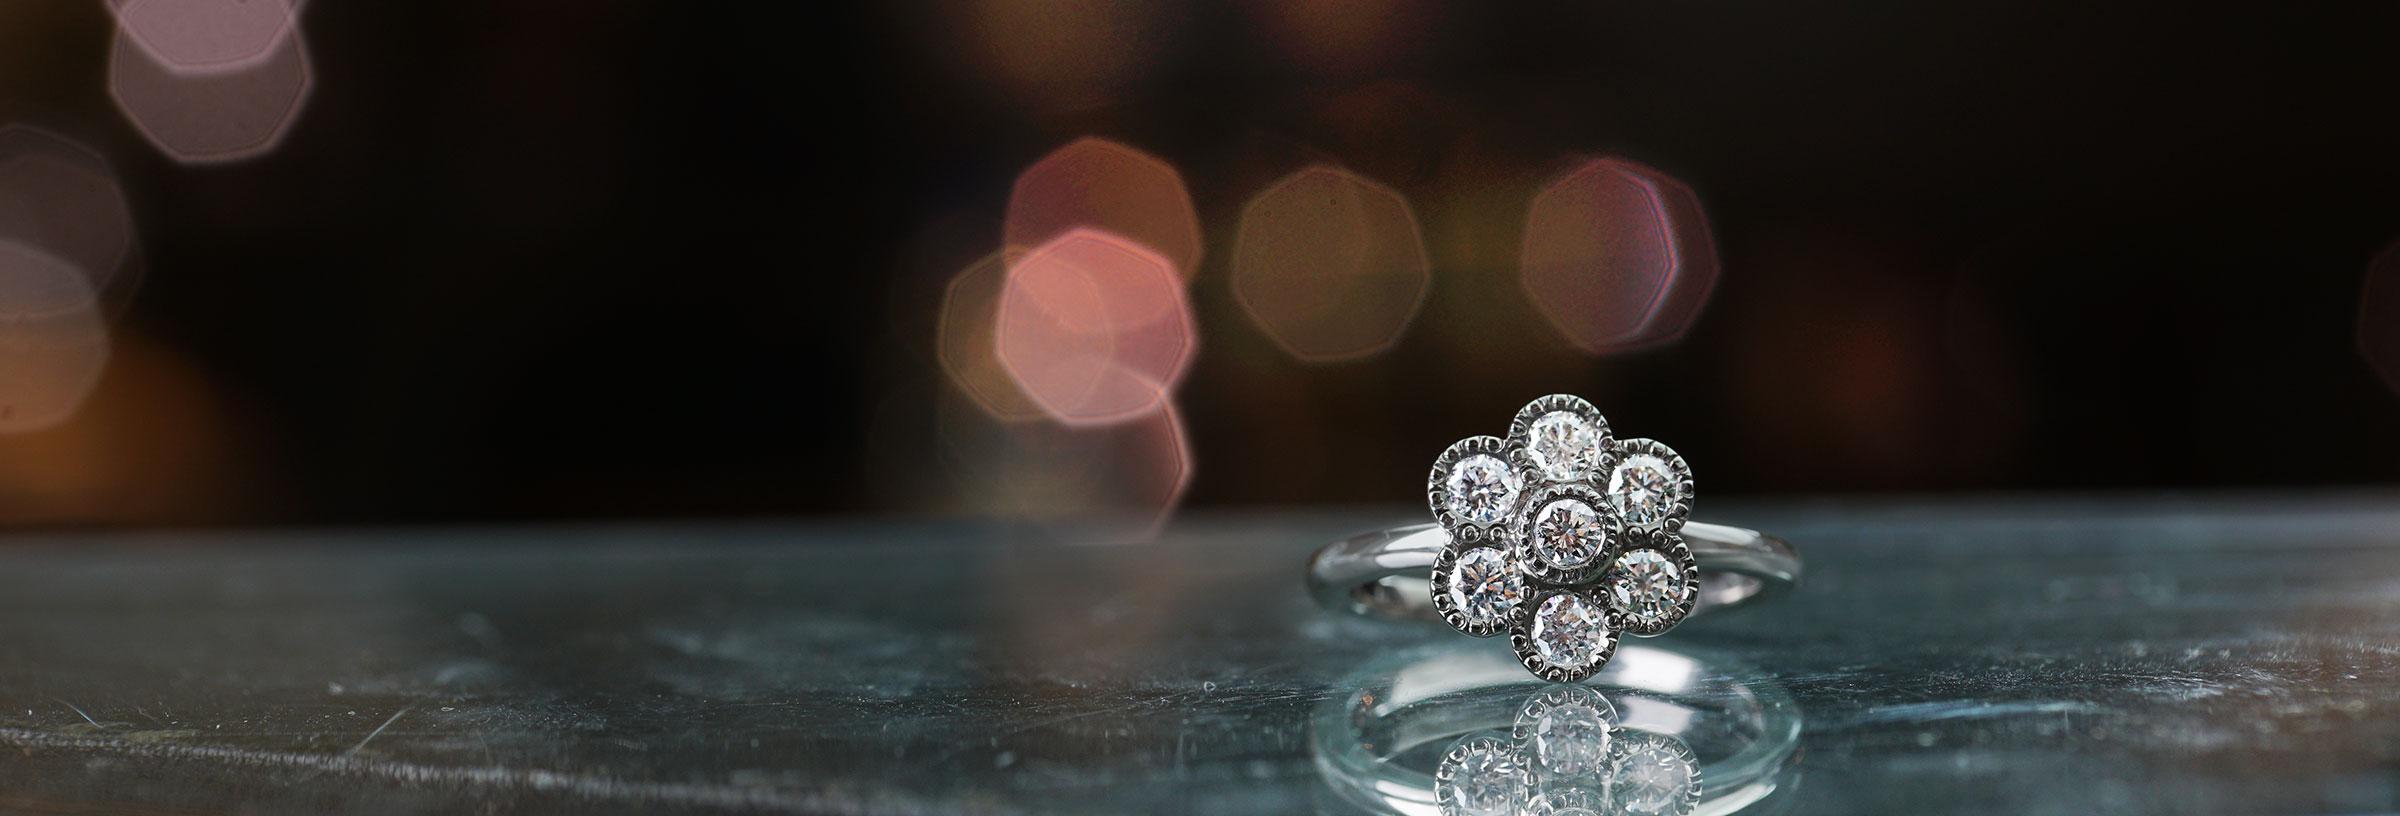 palladium-flower-inspired-diamond-cluster-with-beading